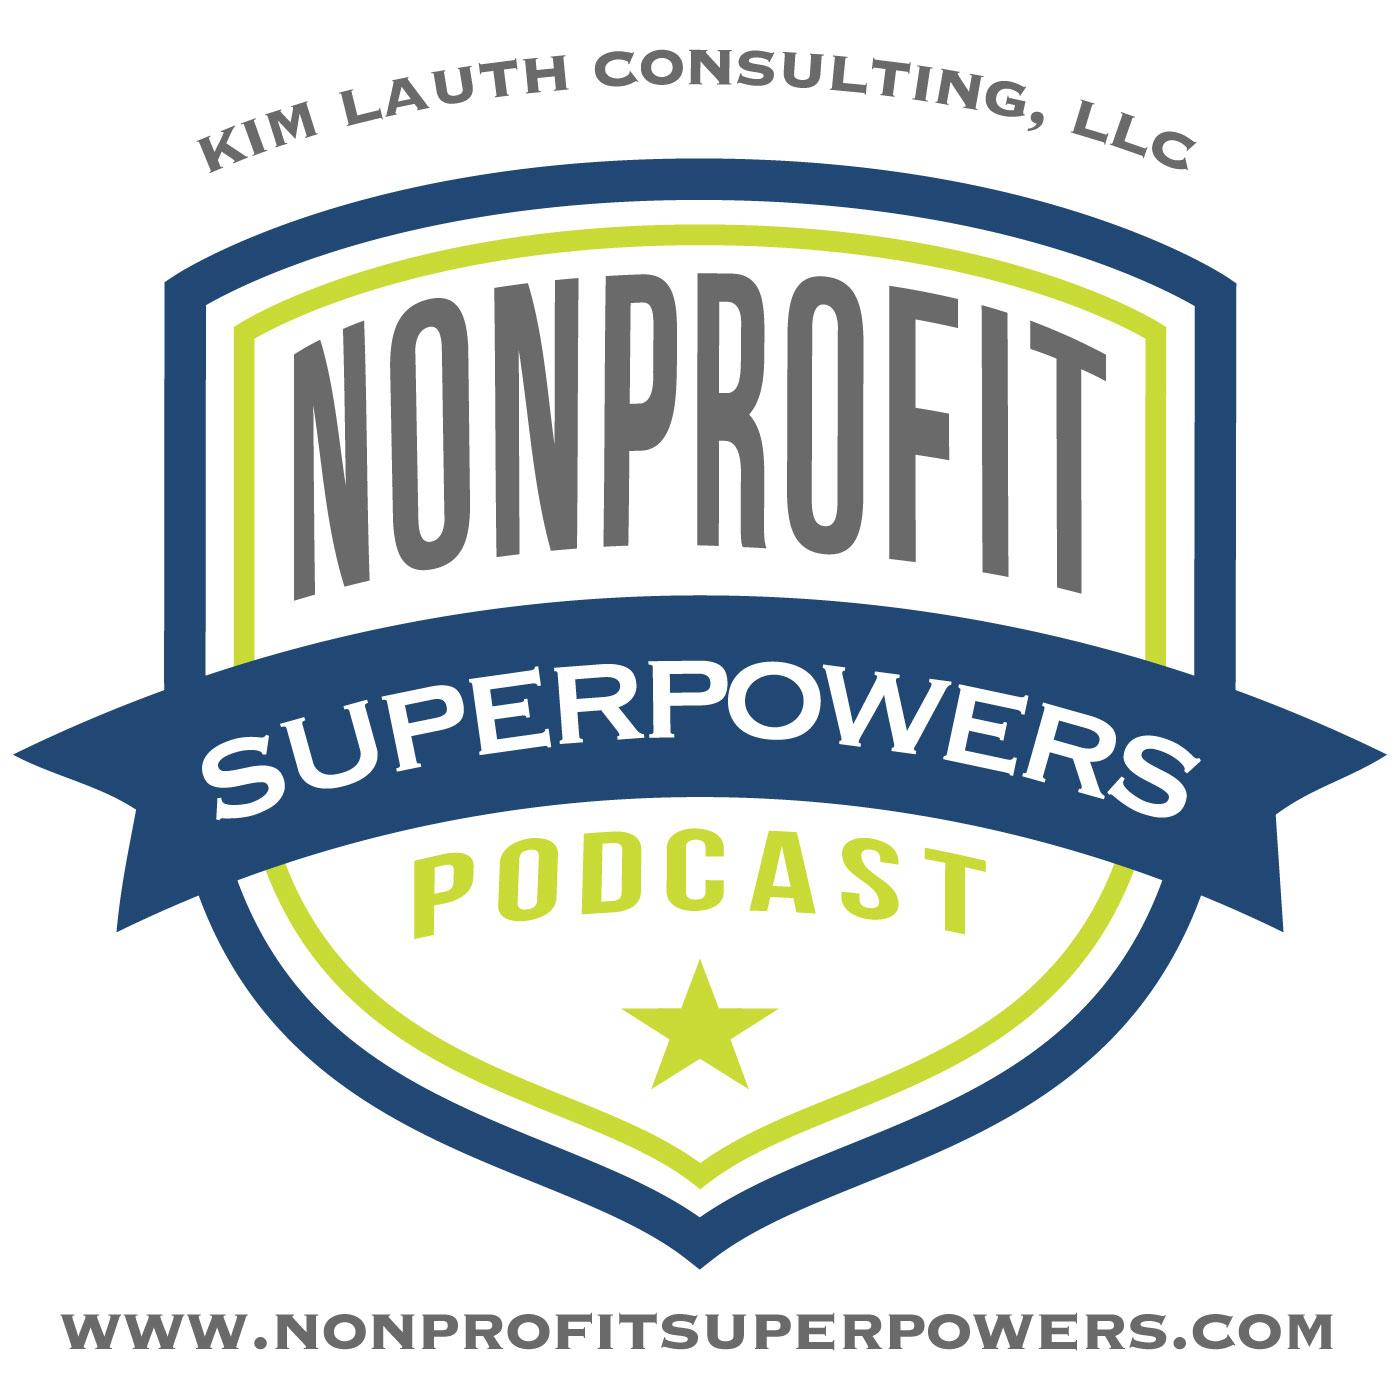 17-KLC-002-Nonprofit-Super-Powers-Podcast-Logo---MGR.jpg